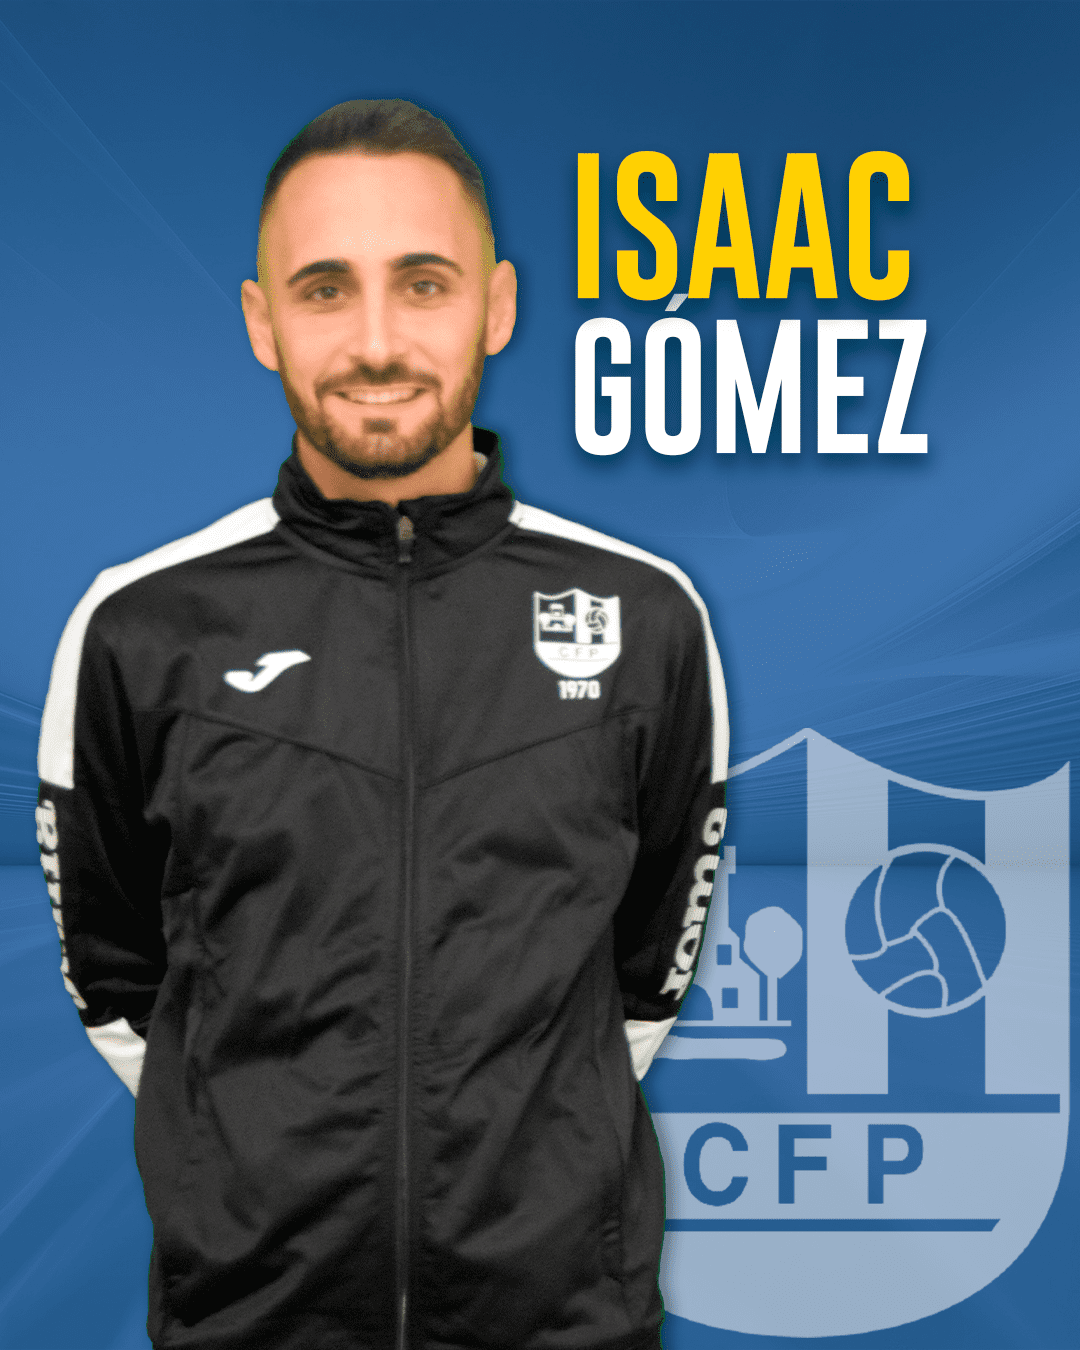 Isaac Gómez